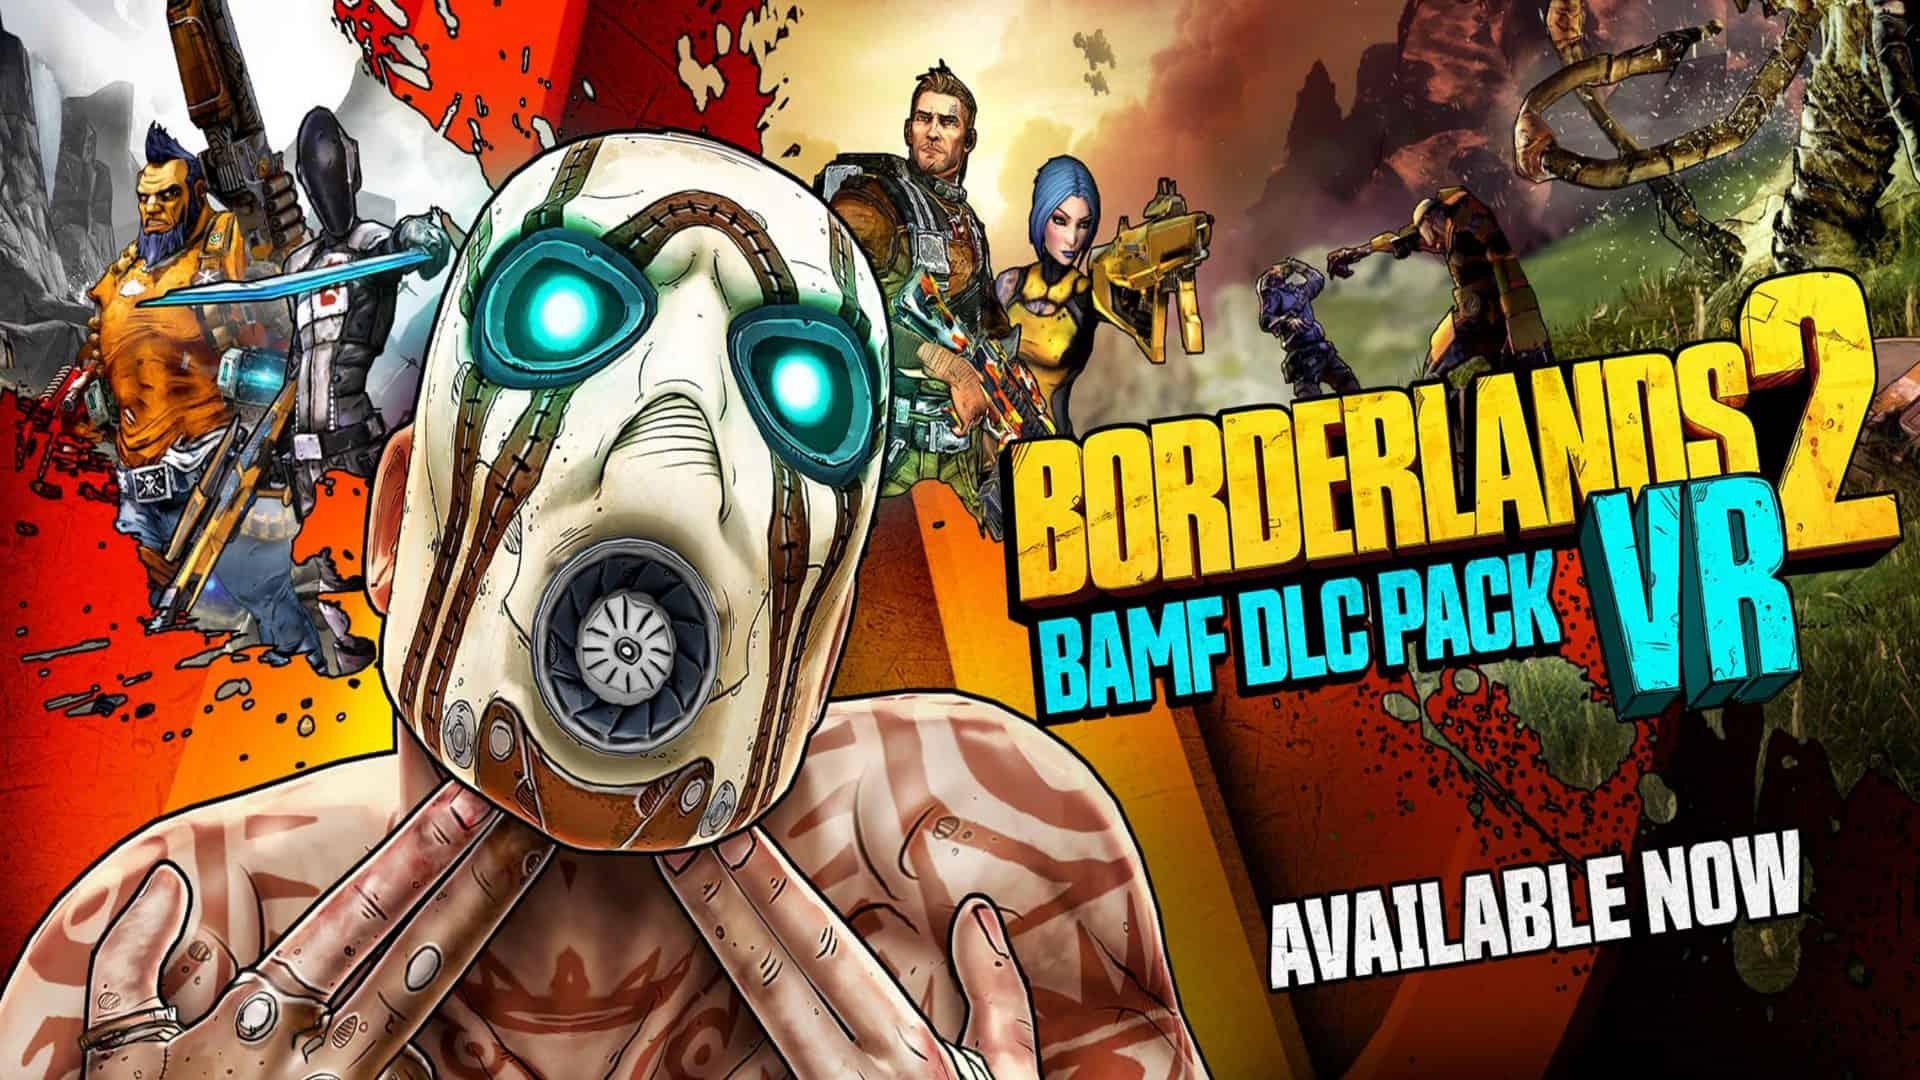 2K Games Announce Free DLC For Borderlands 2 VR